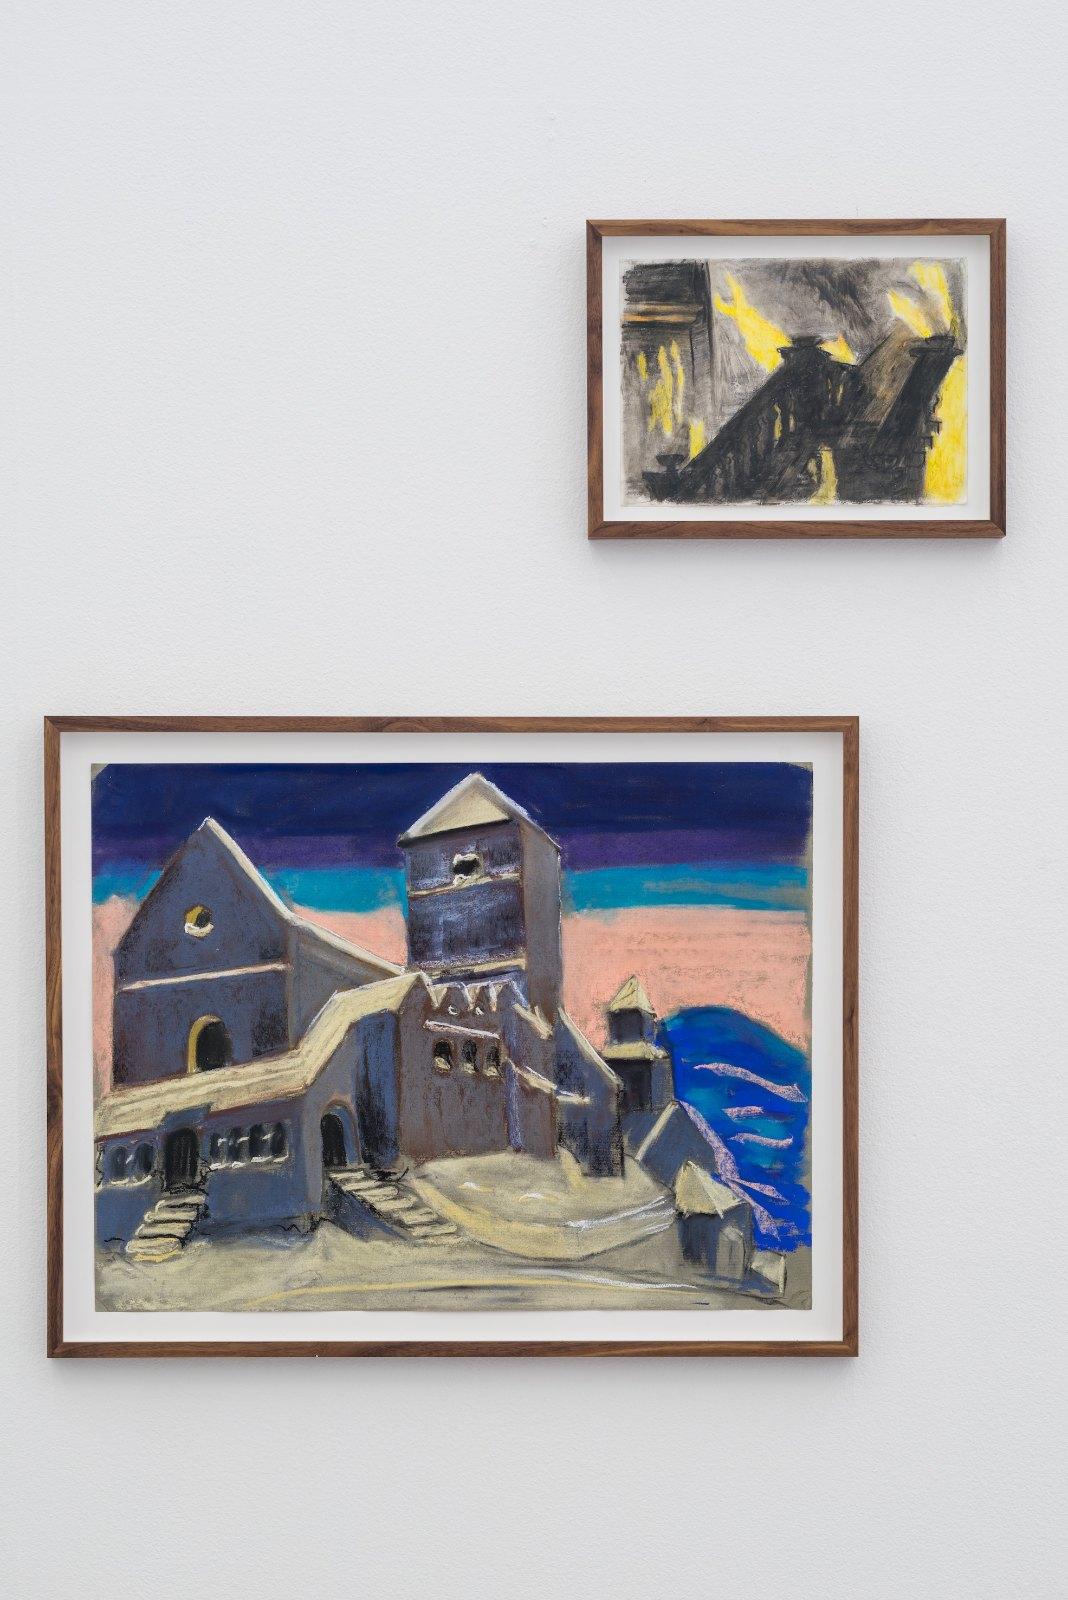 Olle Wärnbäck, Sång 3, 2015, crayon on paper, 63 x 48 cm. Untitled, 2015, crayon on paper, 30 x 21 cm